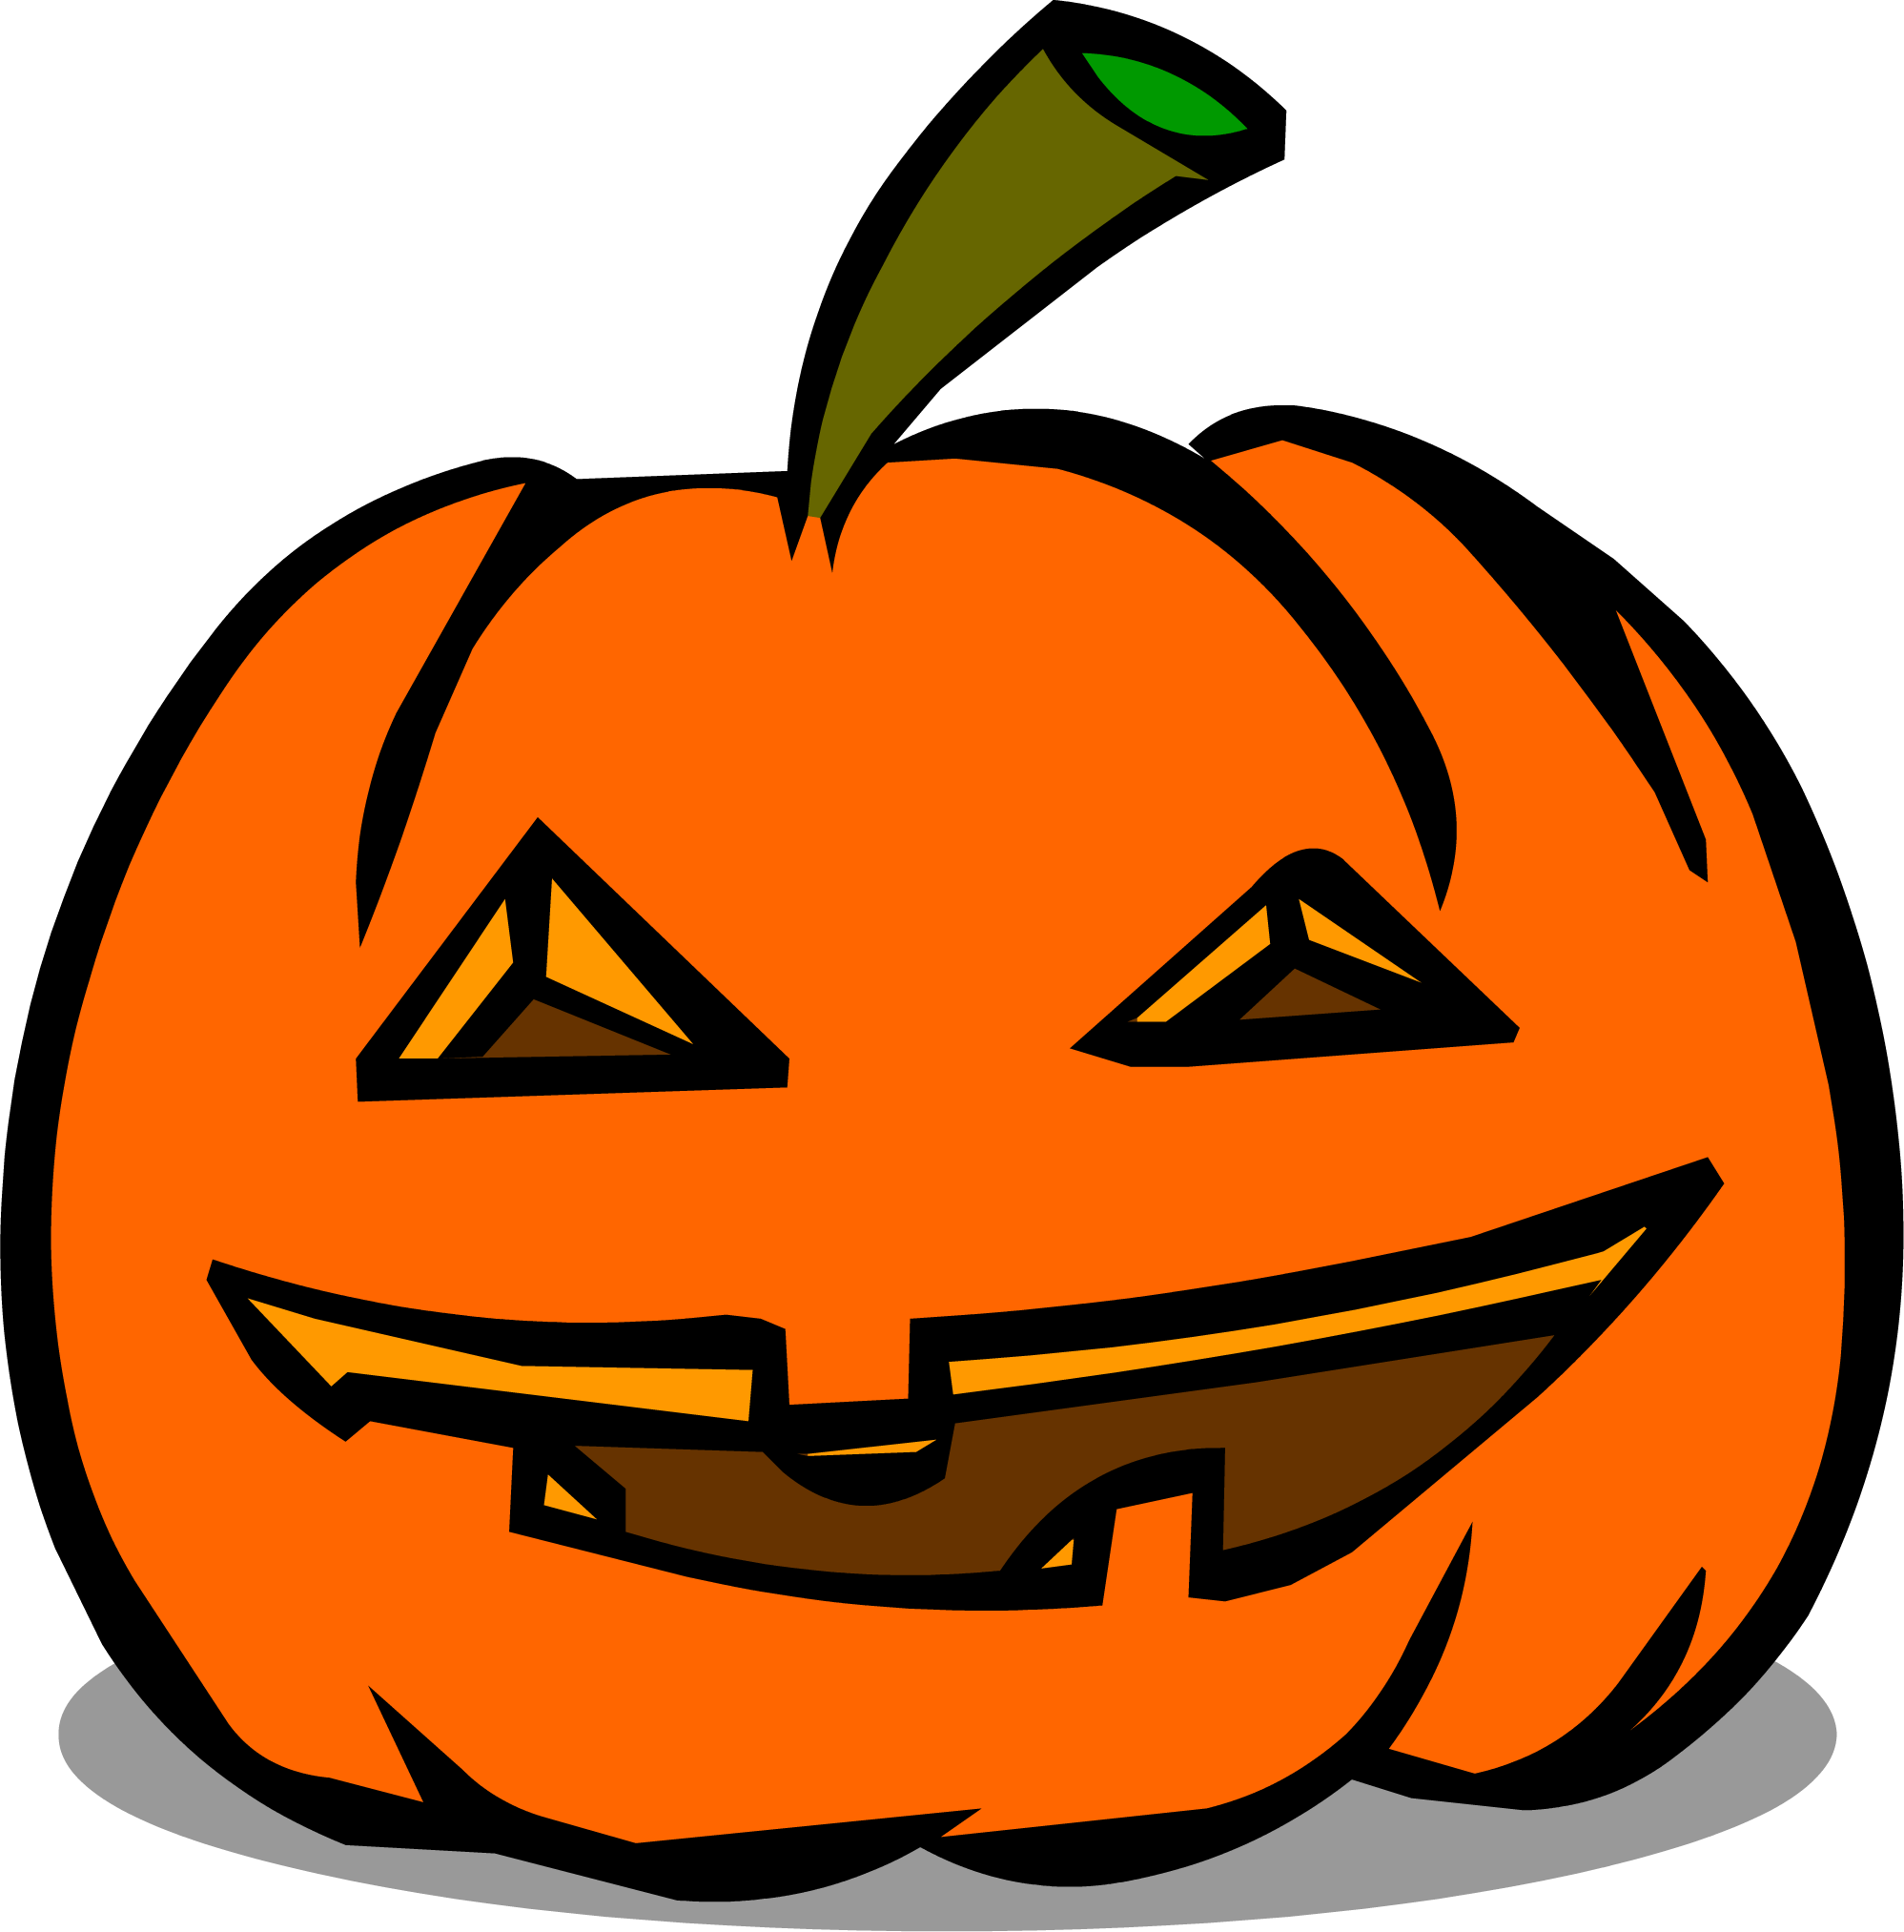 Pumpkin clipart jack o lantern sprite vector free Image - Happy Jack-O-Lantern sprite 002.png | Club Penguin Wiki ... vector free